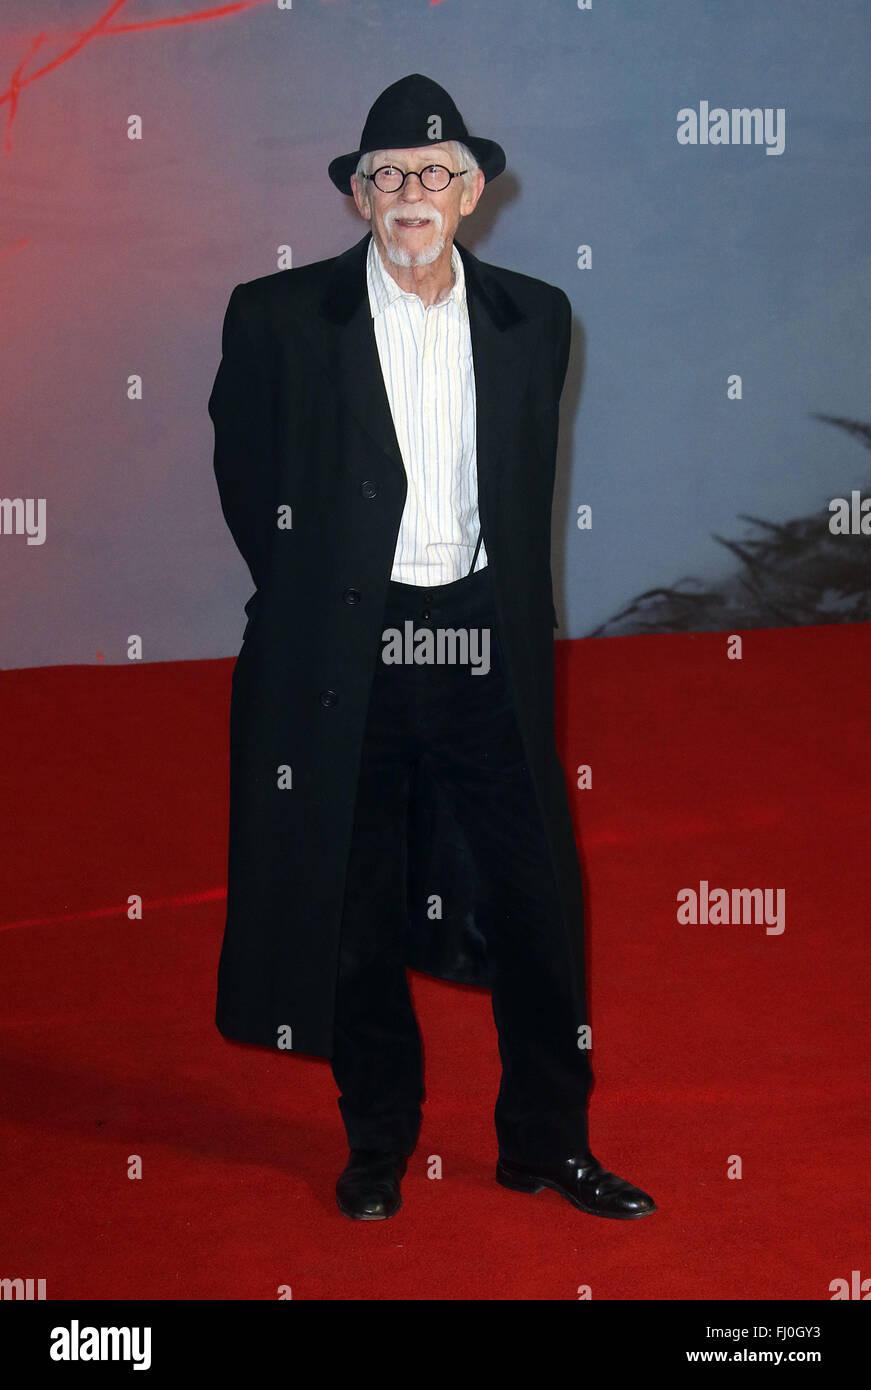 January 12, 2016 - John Hurt attending The Revenant' UK Premiere at Empire Cinema, Leicester Square, London, - Stock Image